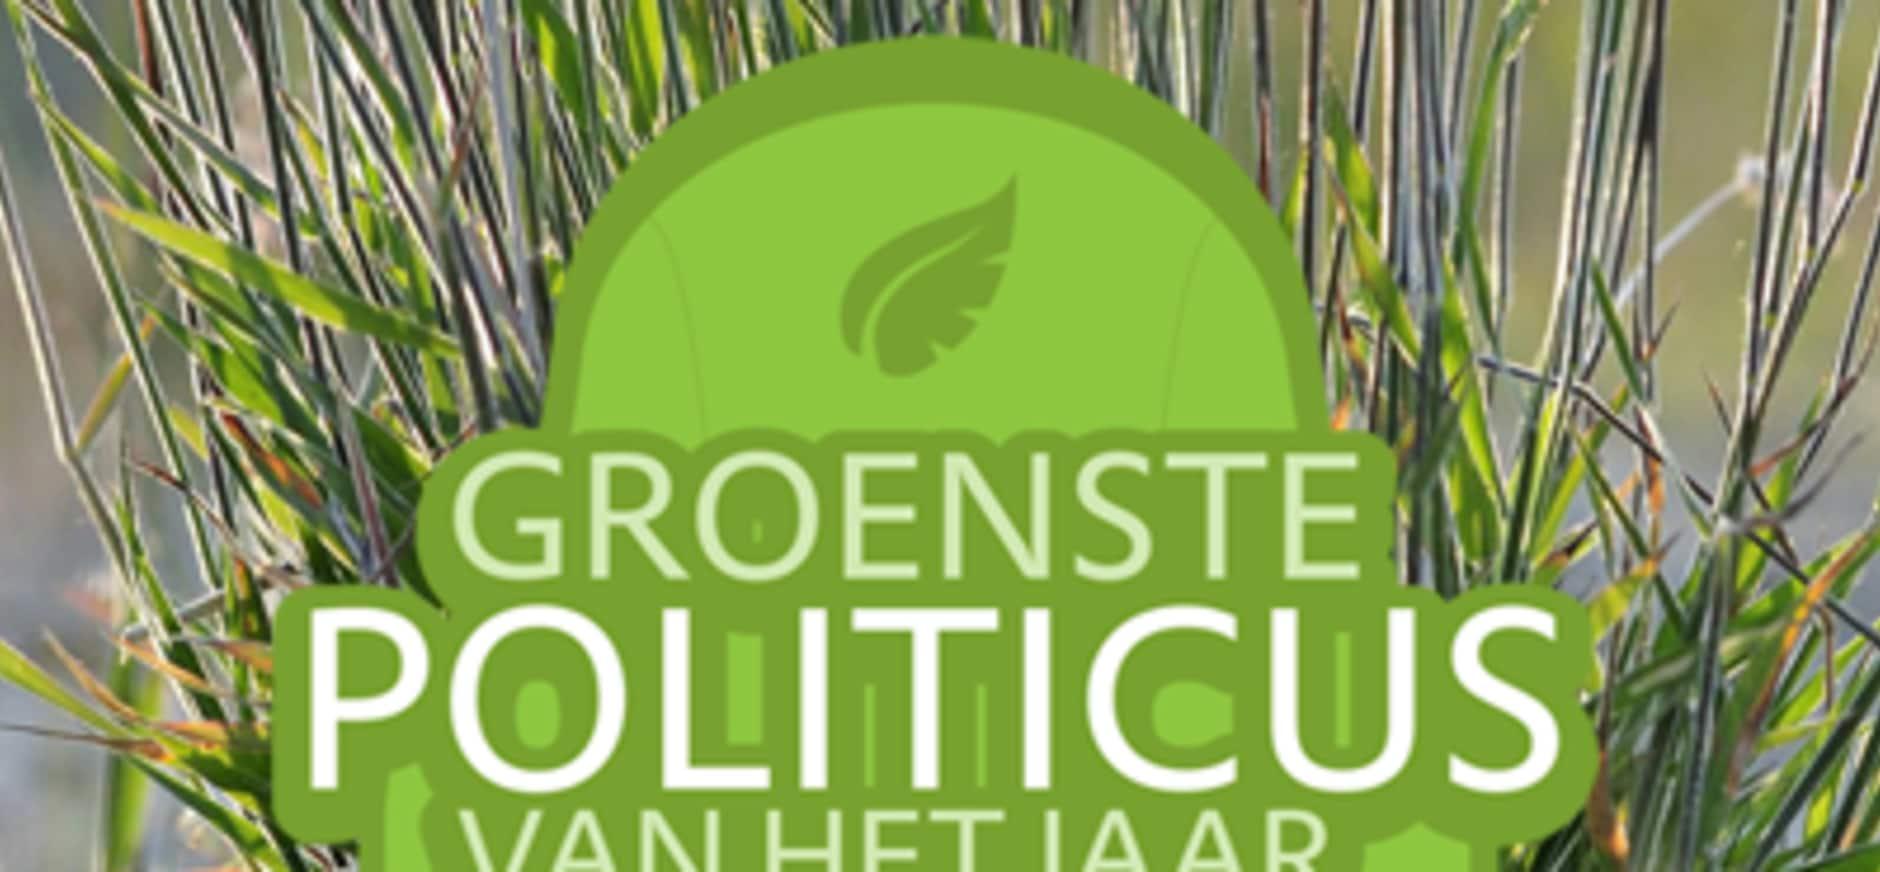 Verkiezing Groenste Politicus van 2015